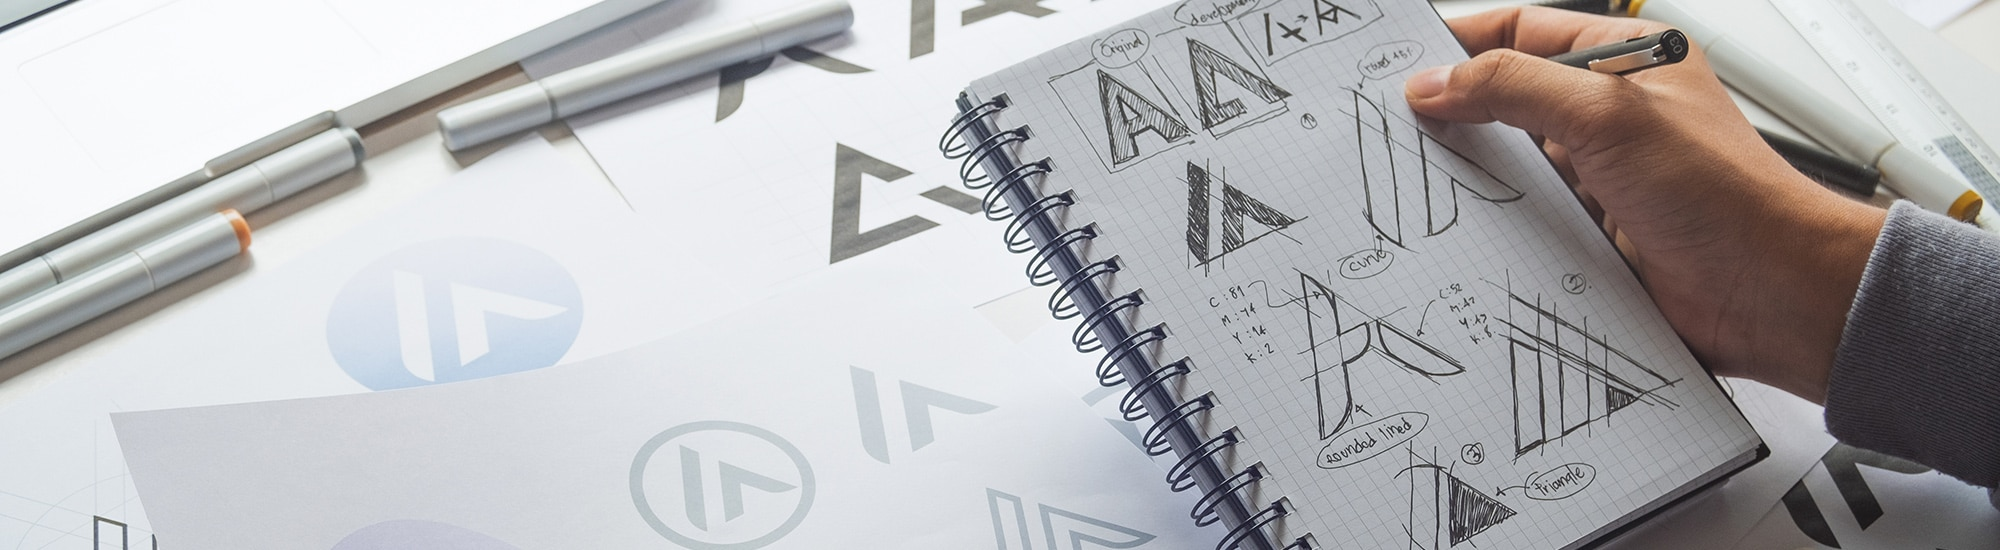 Stratégie image de marque